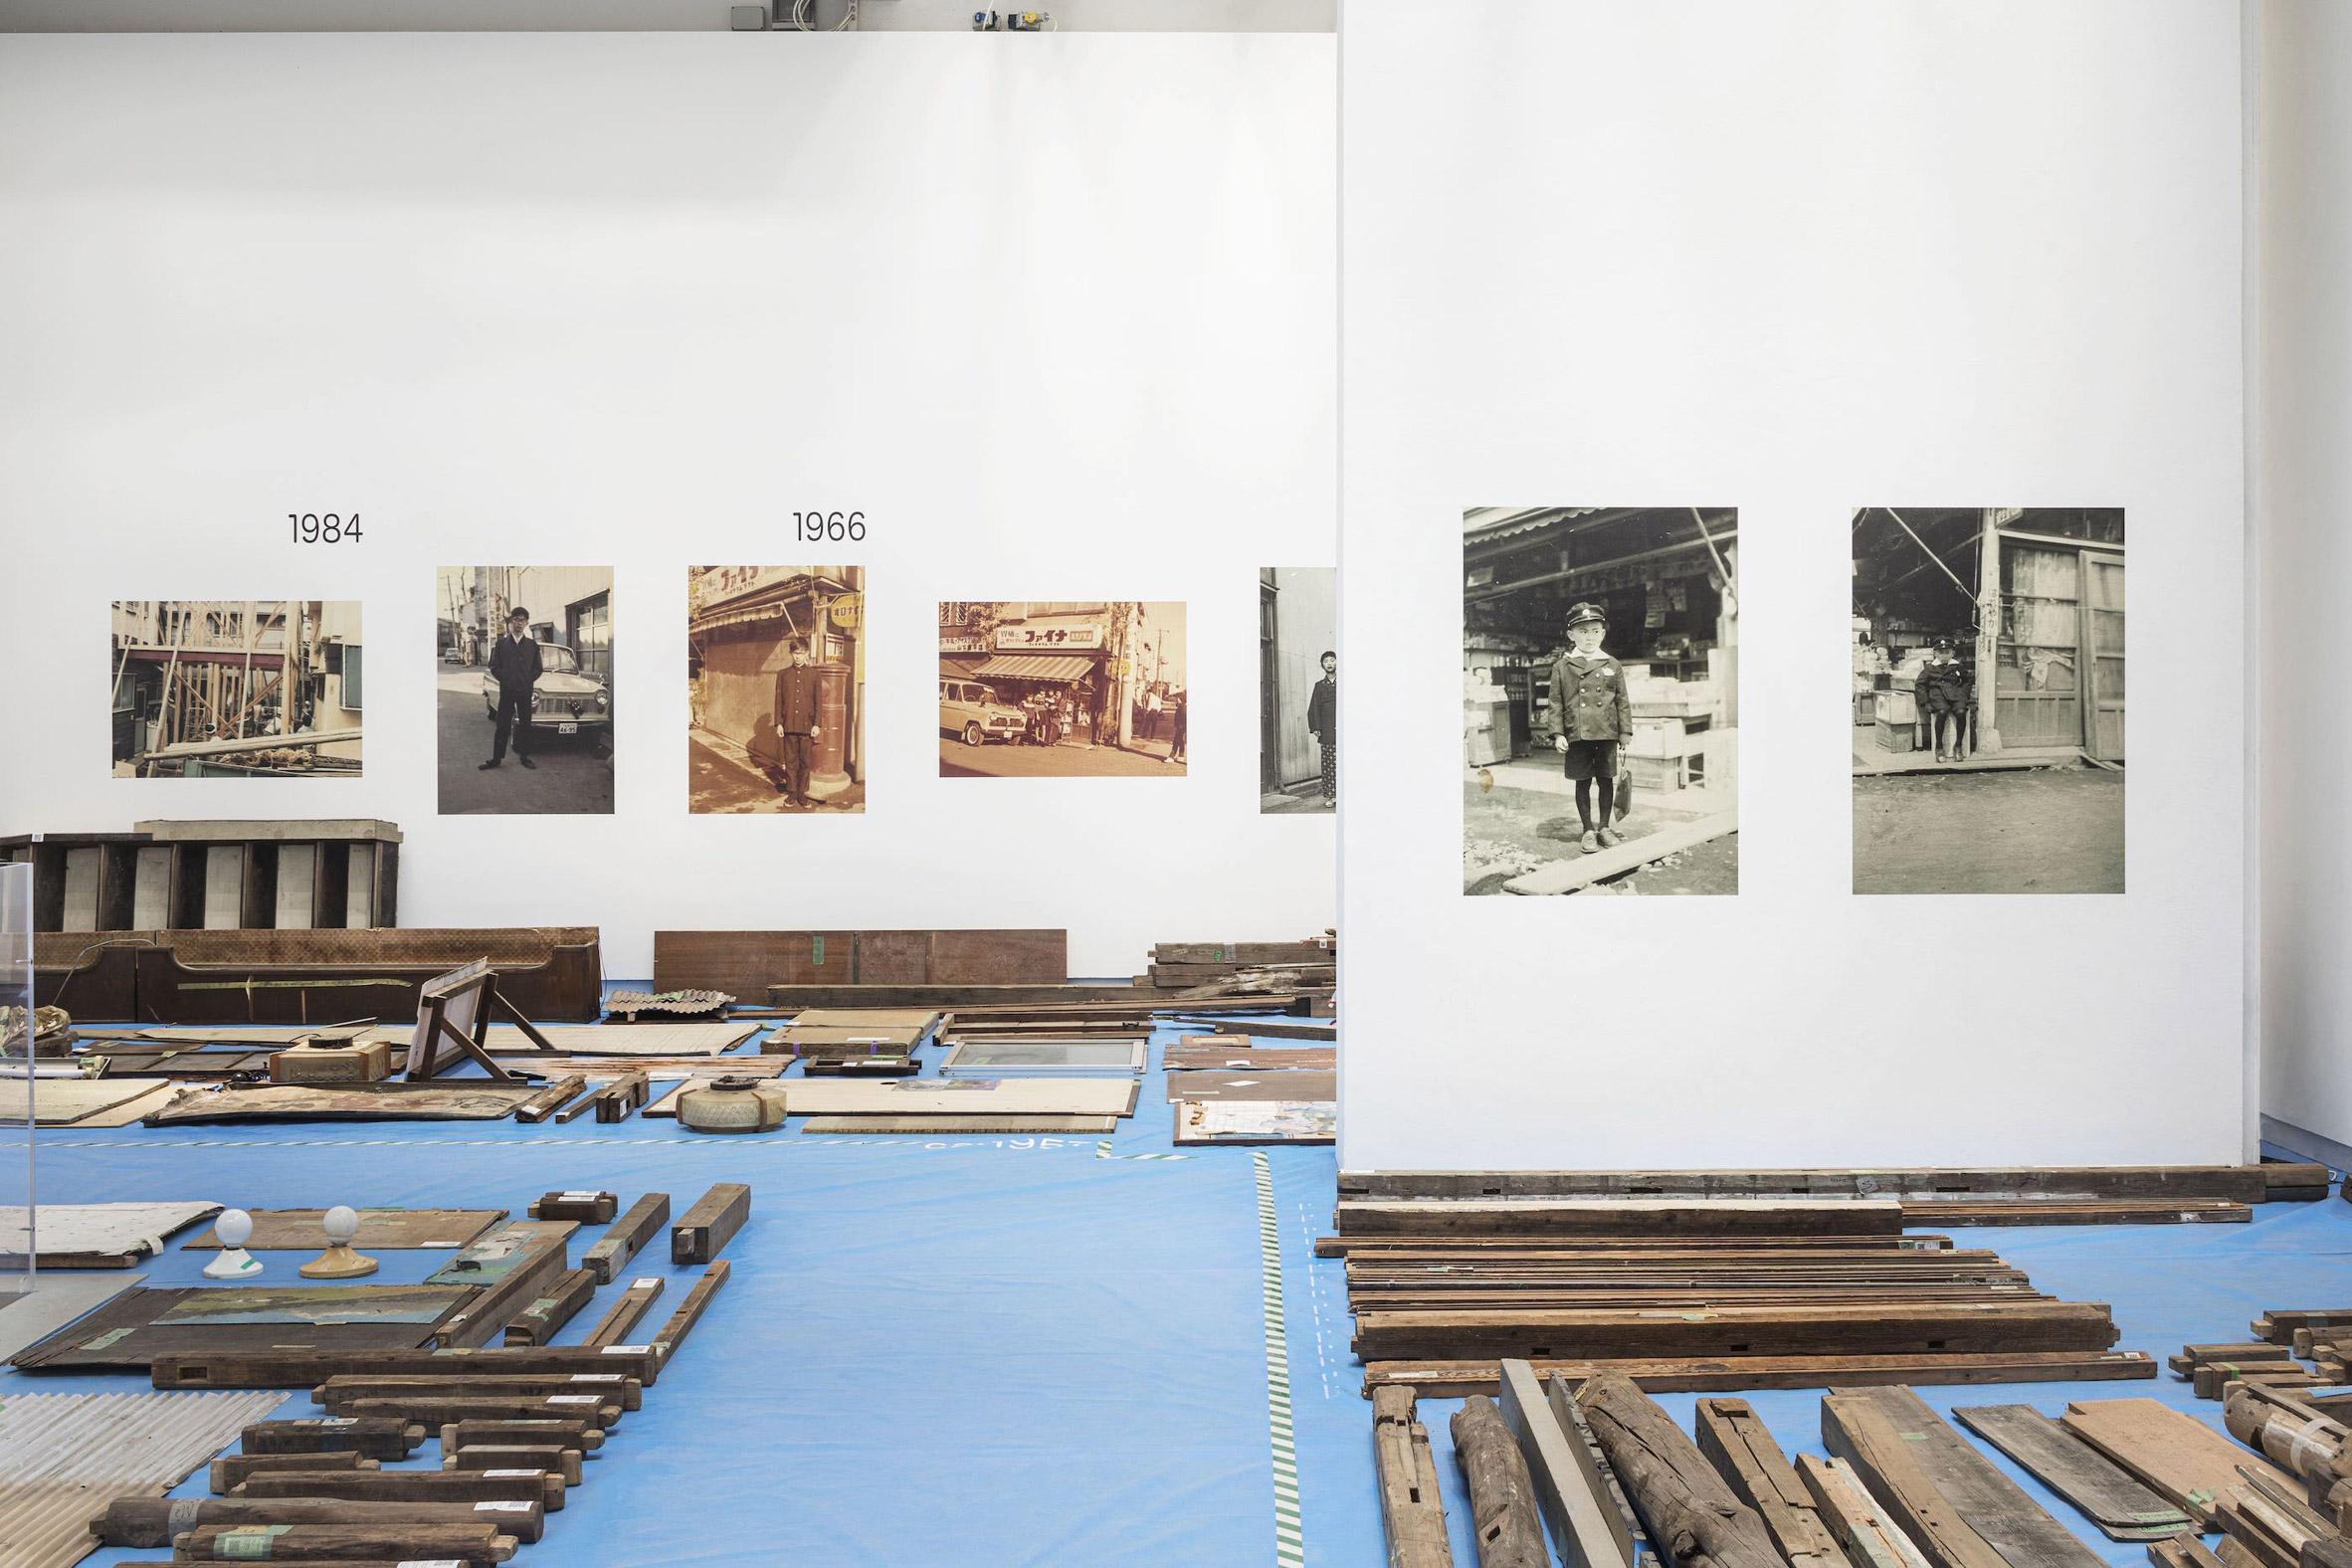 Inside of Japan Pavilion at the Venice Architecture Biennale